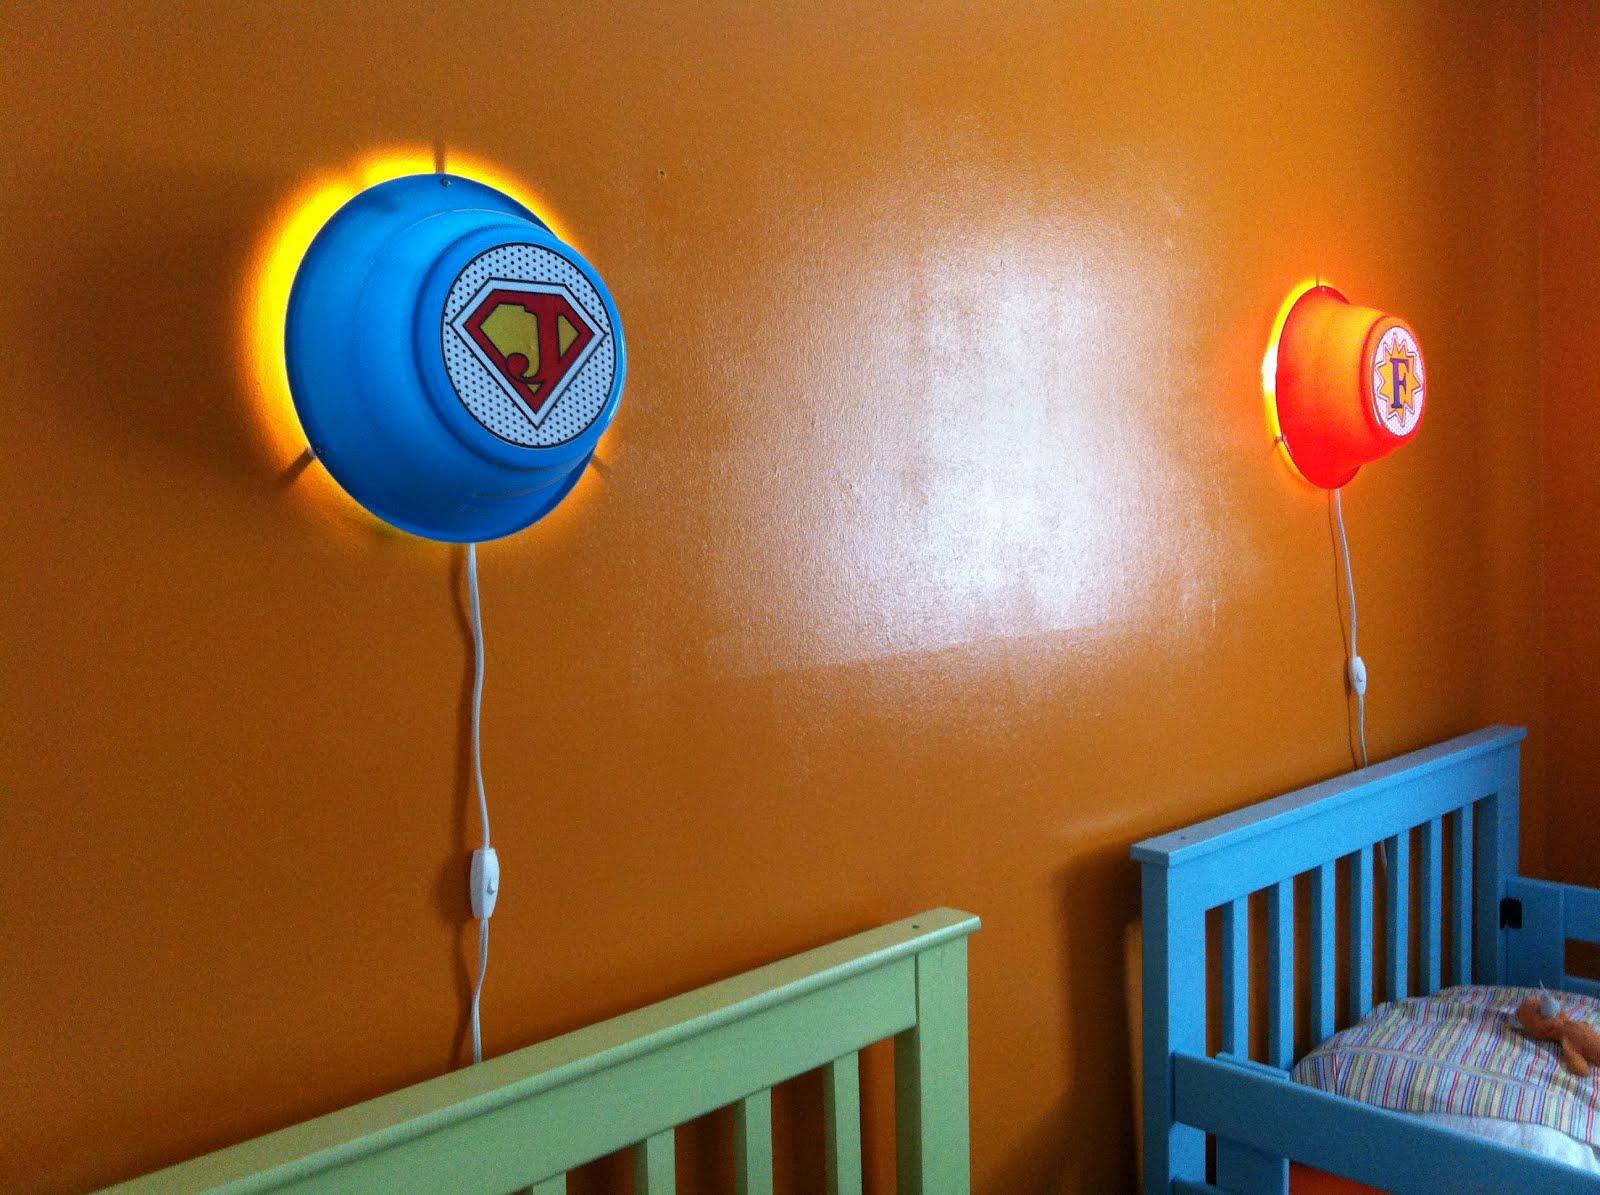 wall lamp for kids room 58 wall light kids, sun shaped kids room wall night light lamp KRNQZSS